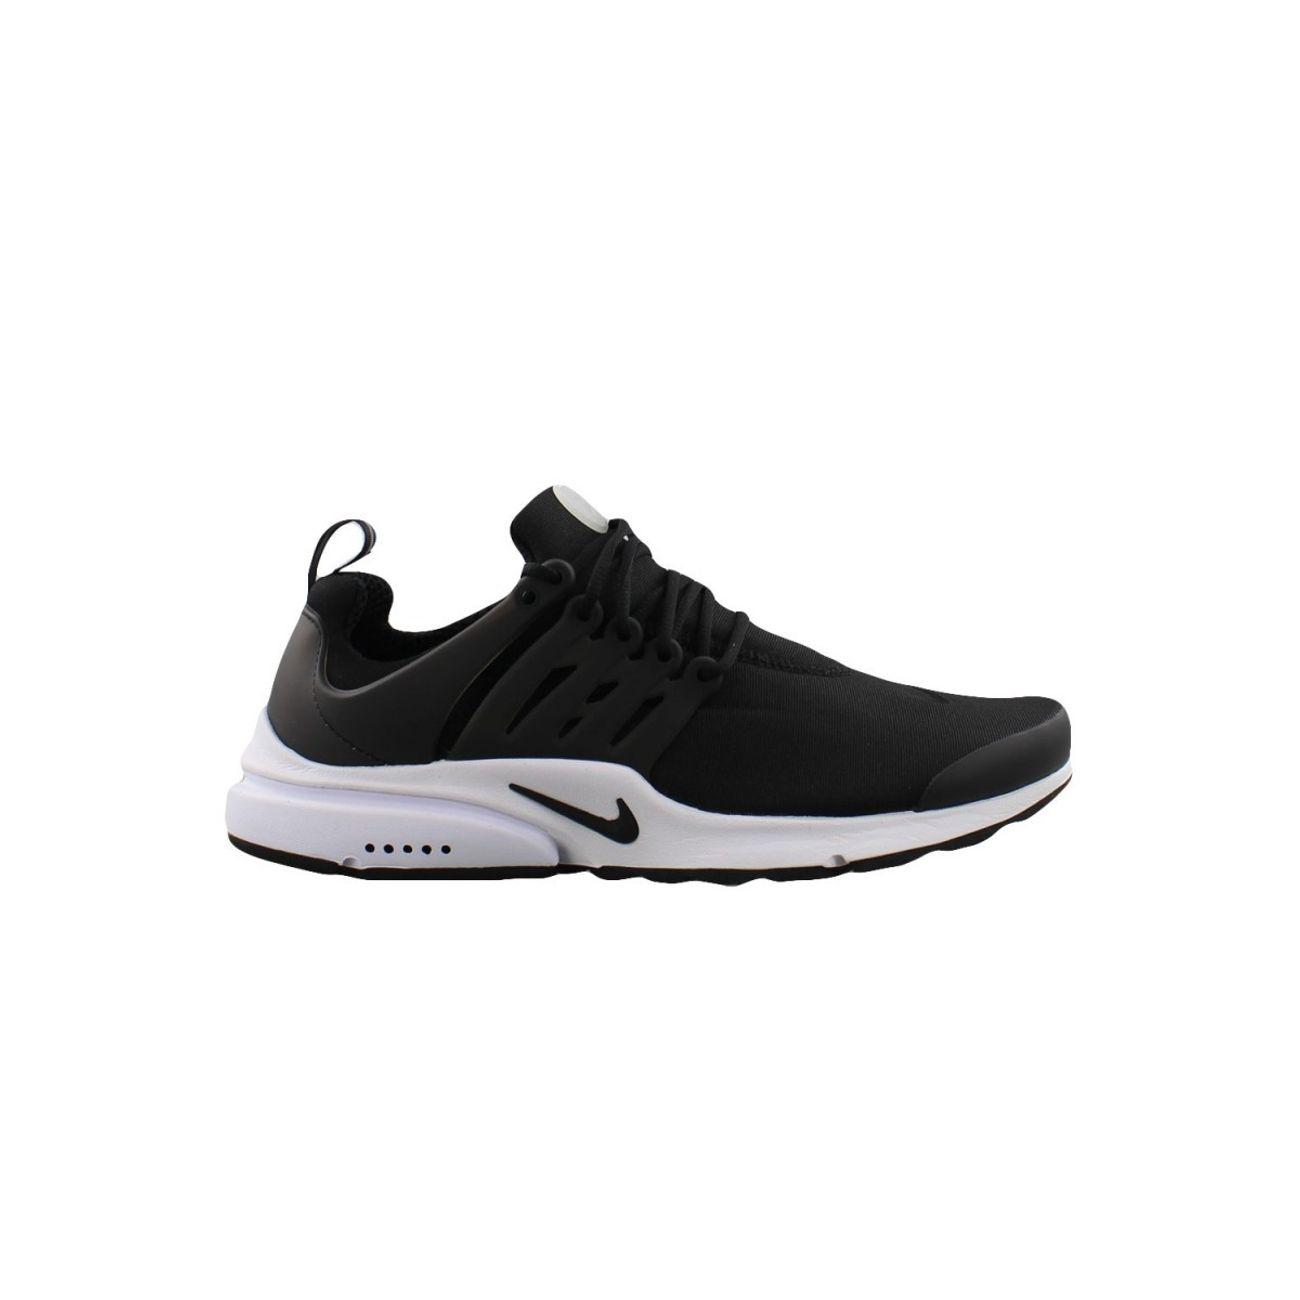 Mode- Lifestyle homme NIKE Baskets Nike Air Presto Essential - 848187009